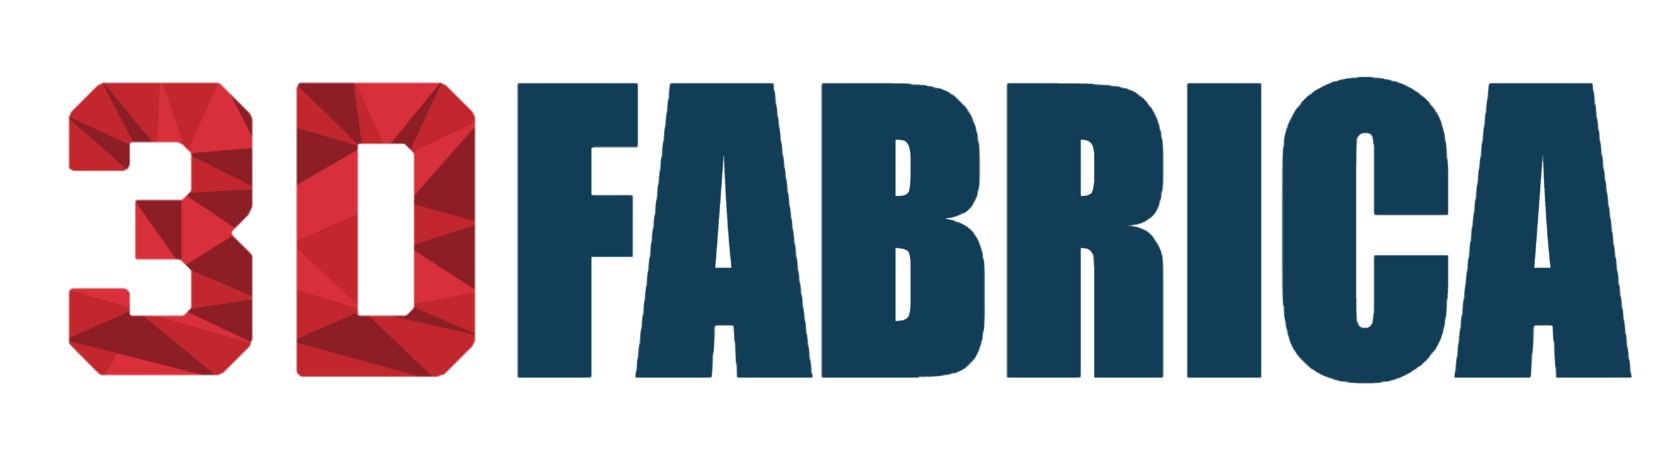 3DFabrica